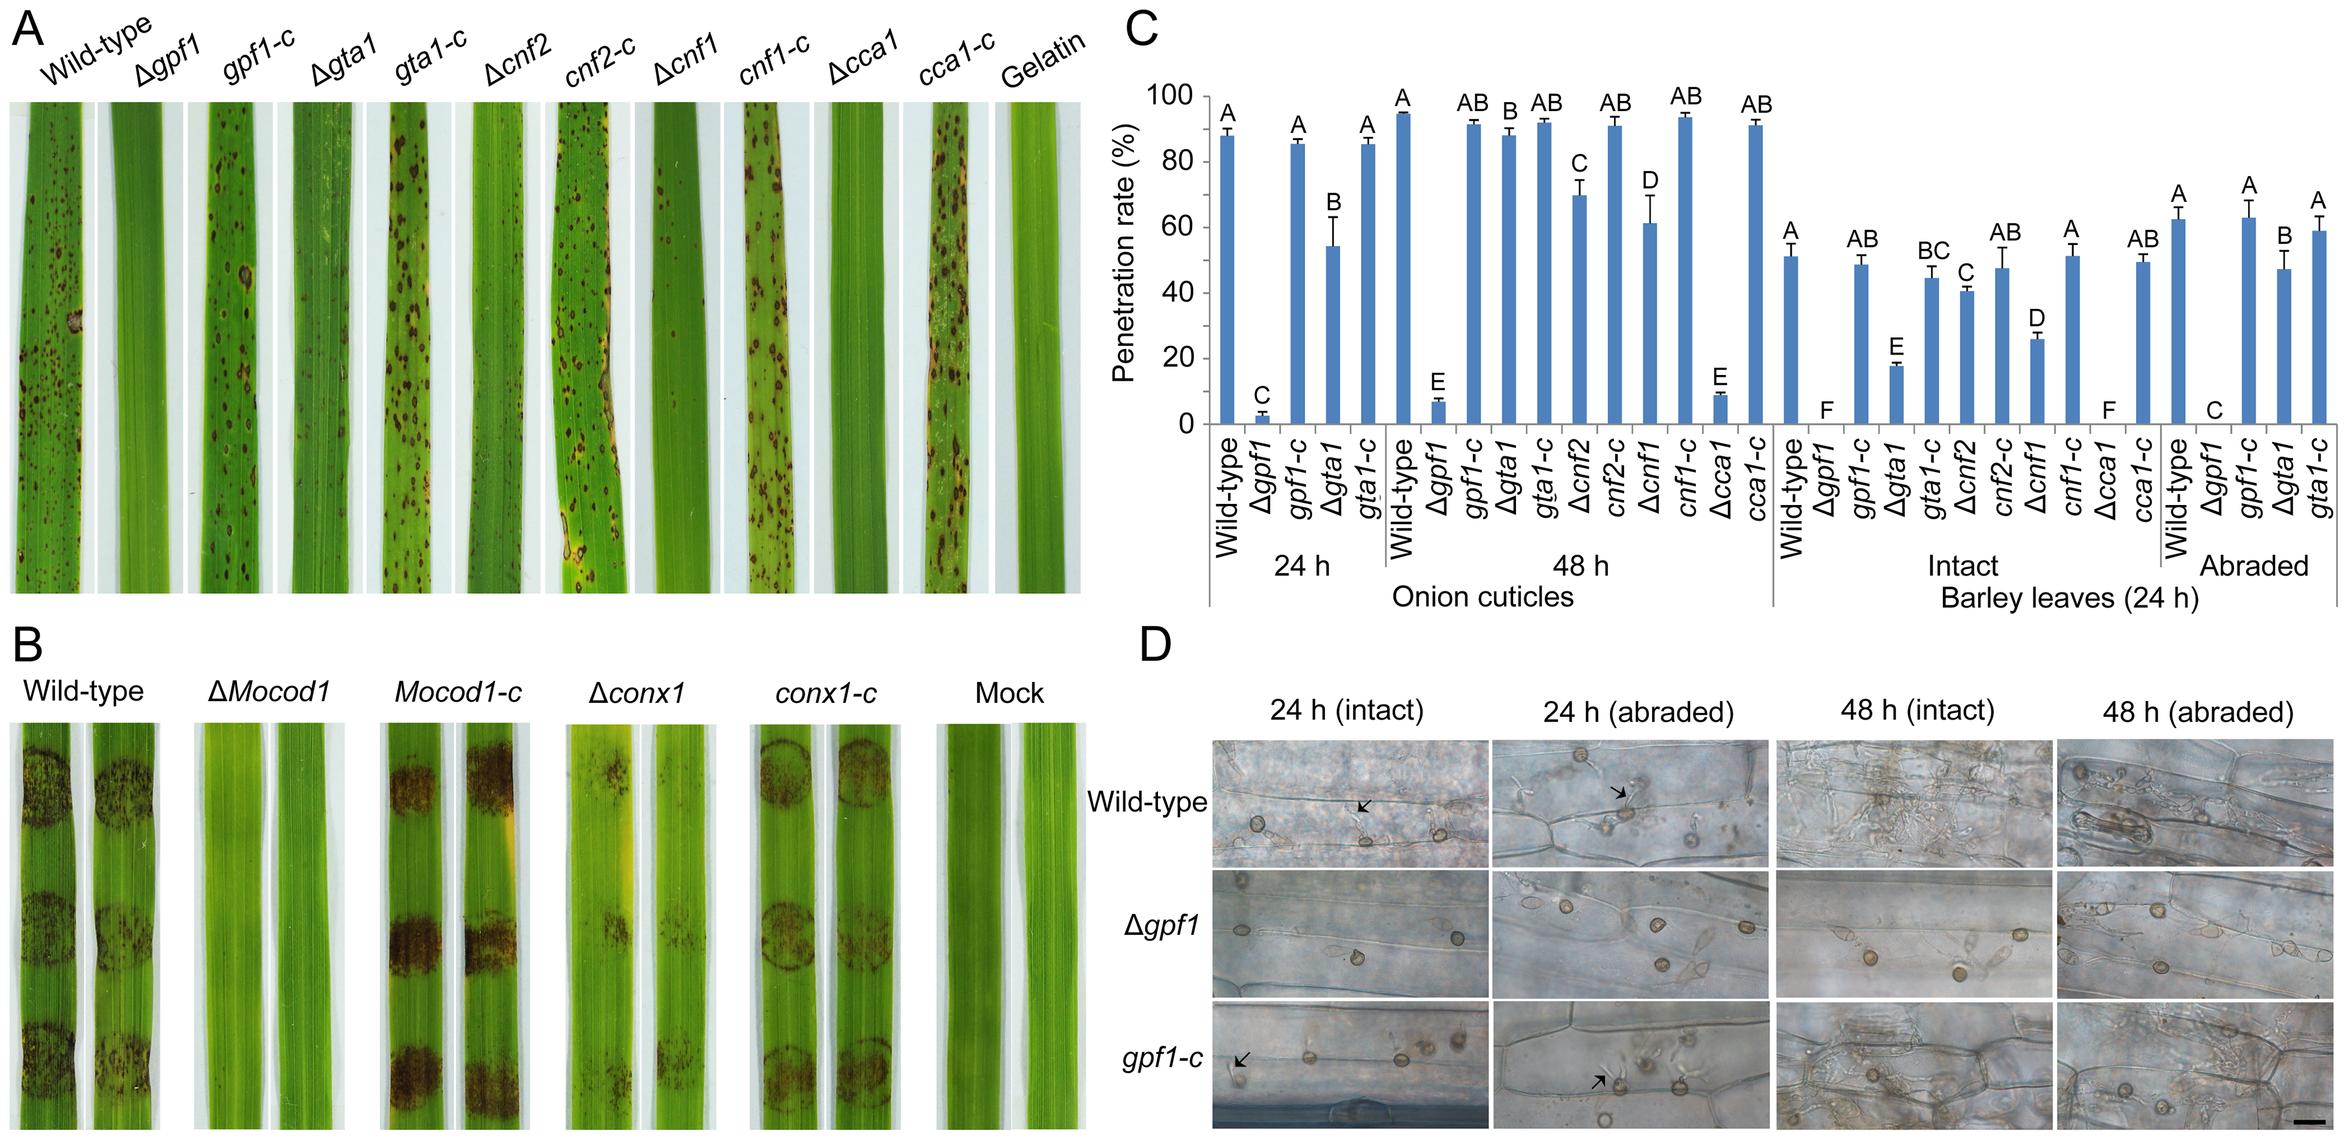 Pathogenicity assay of the <i>M. oryzae</i> strains.